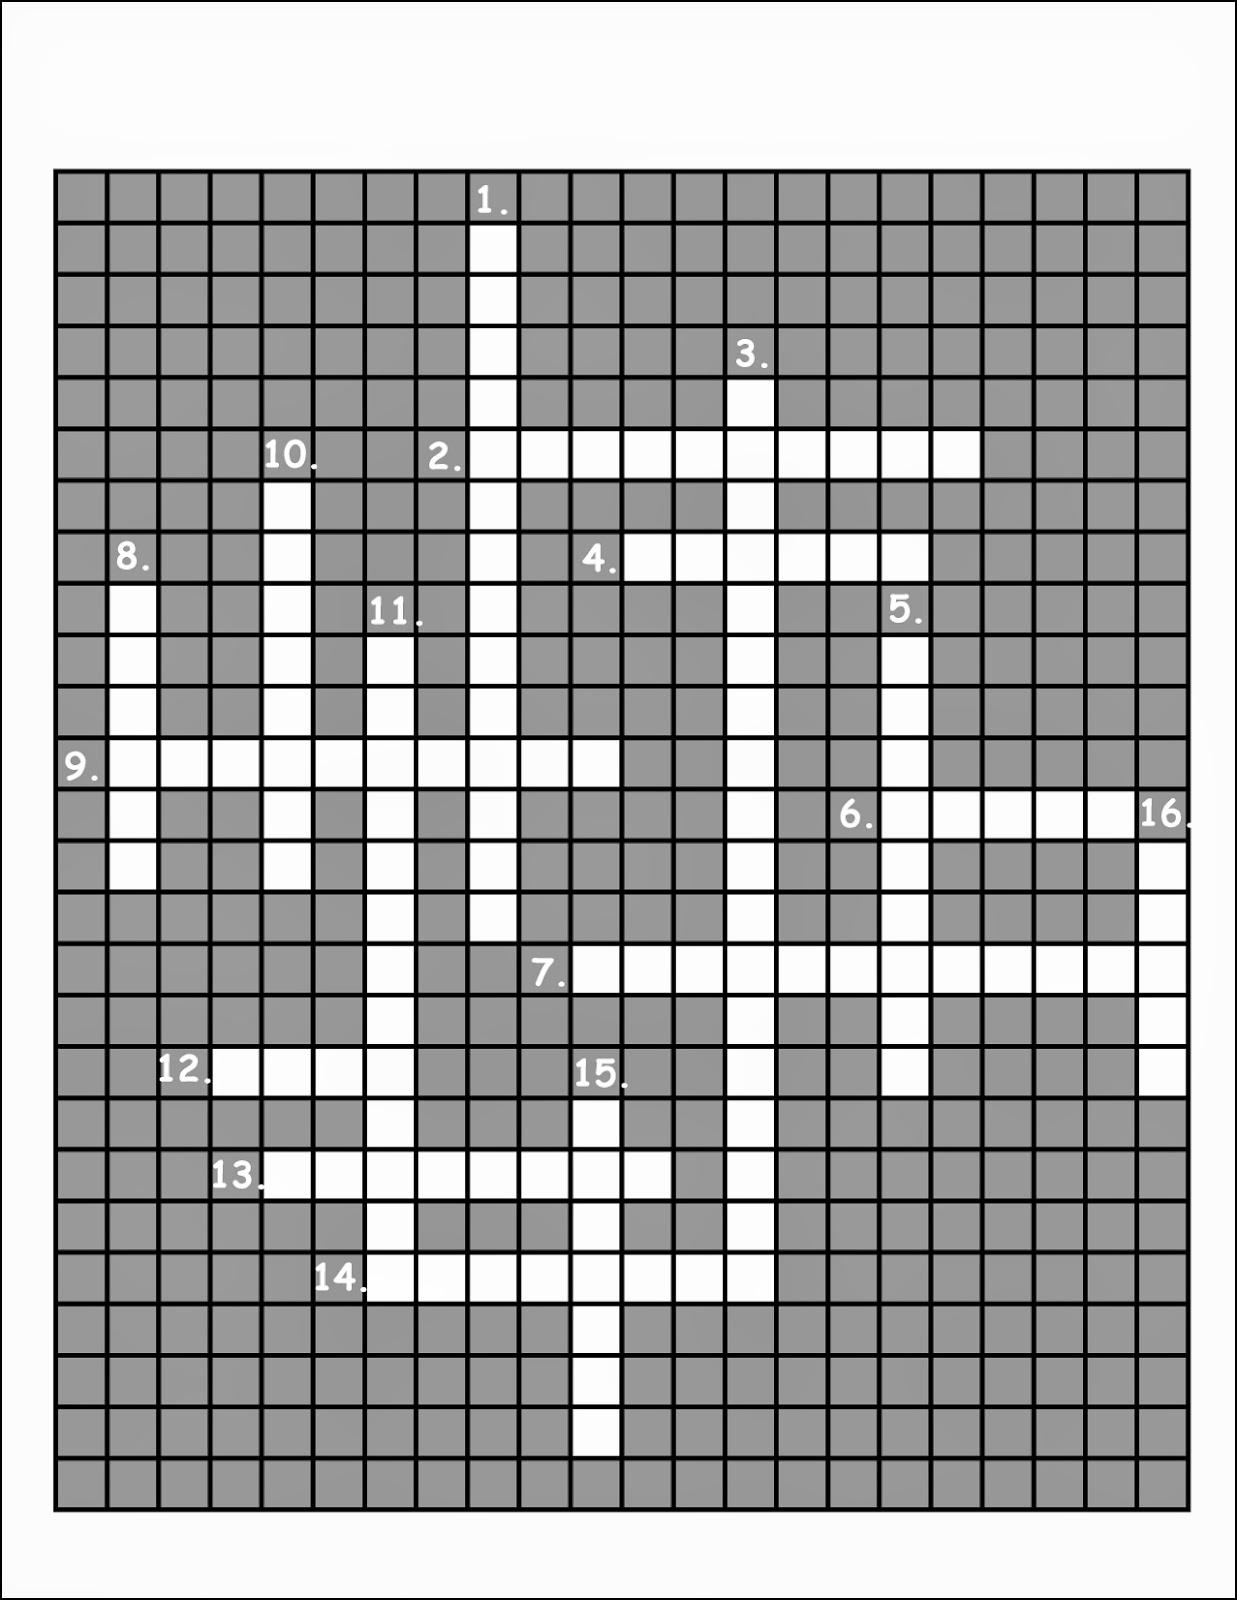 Win Free Tix To Viva Pomona 3 Via The Ap Viva Pomona Crossword Puzzle American Pancake